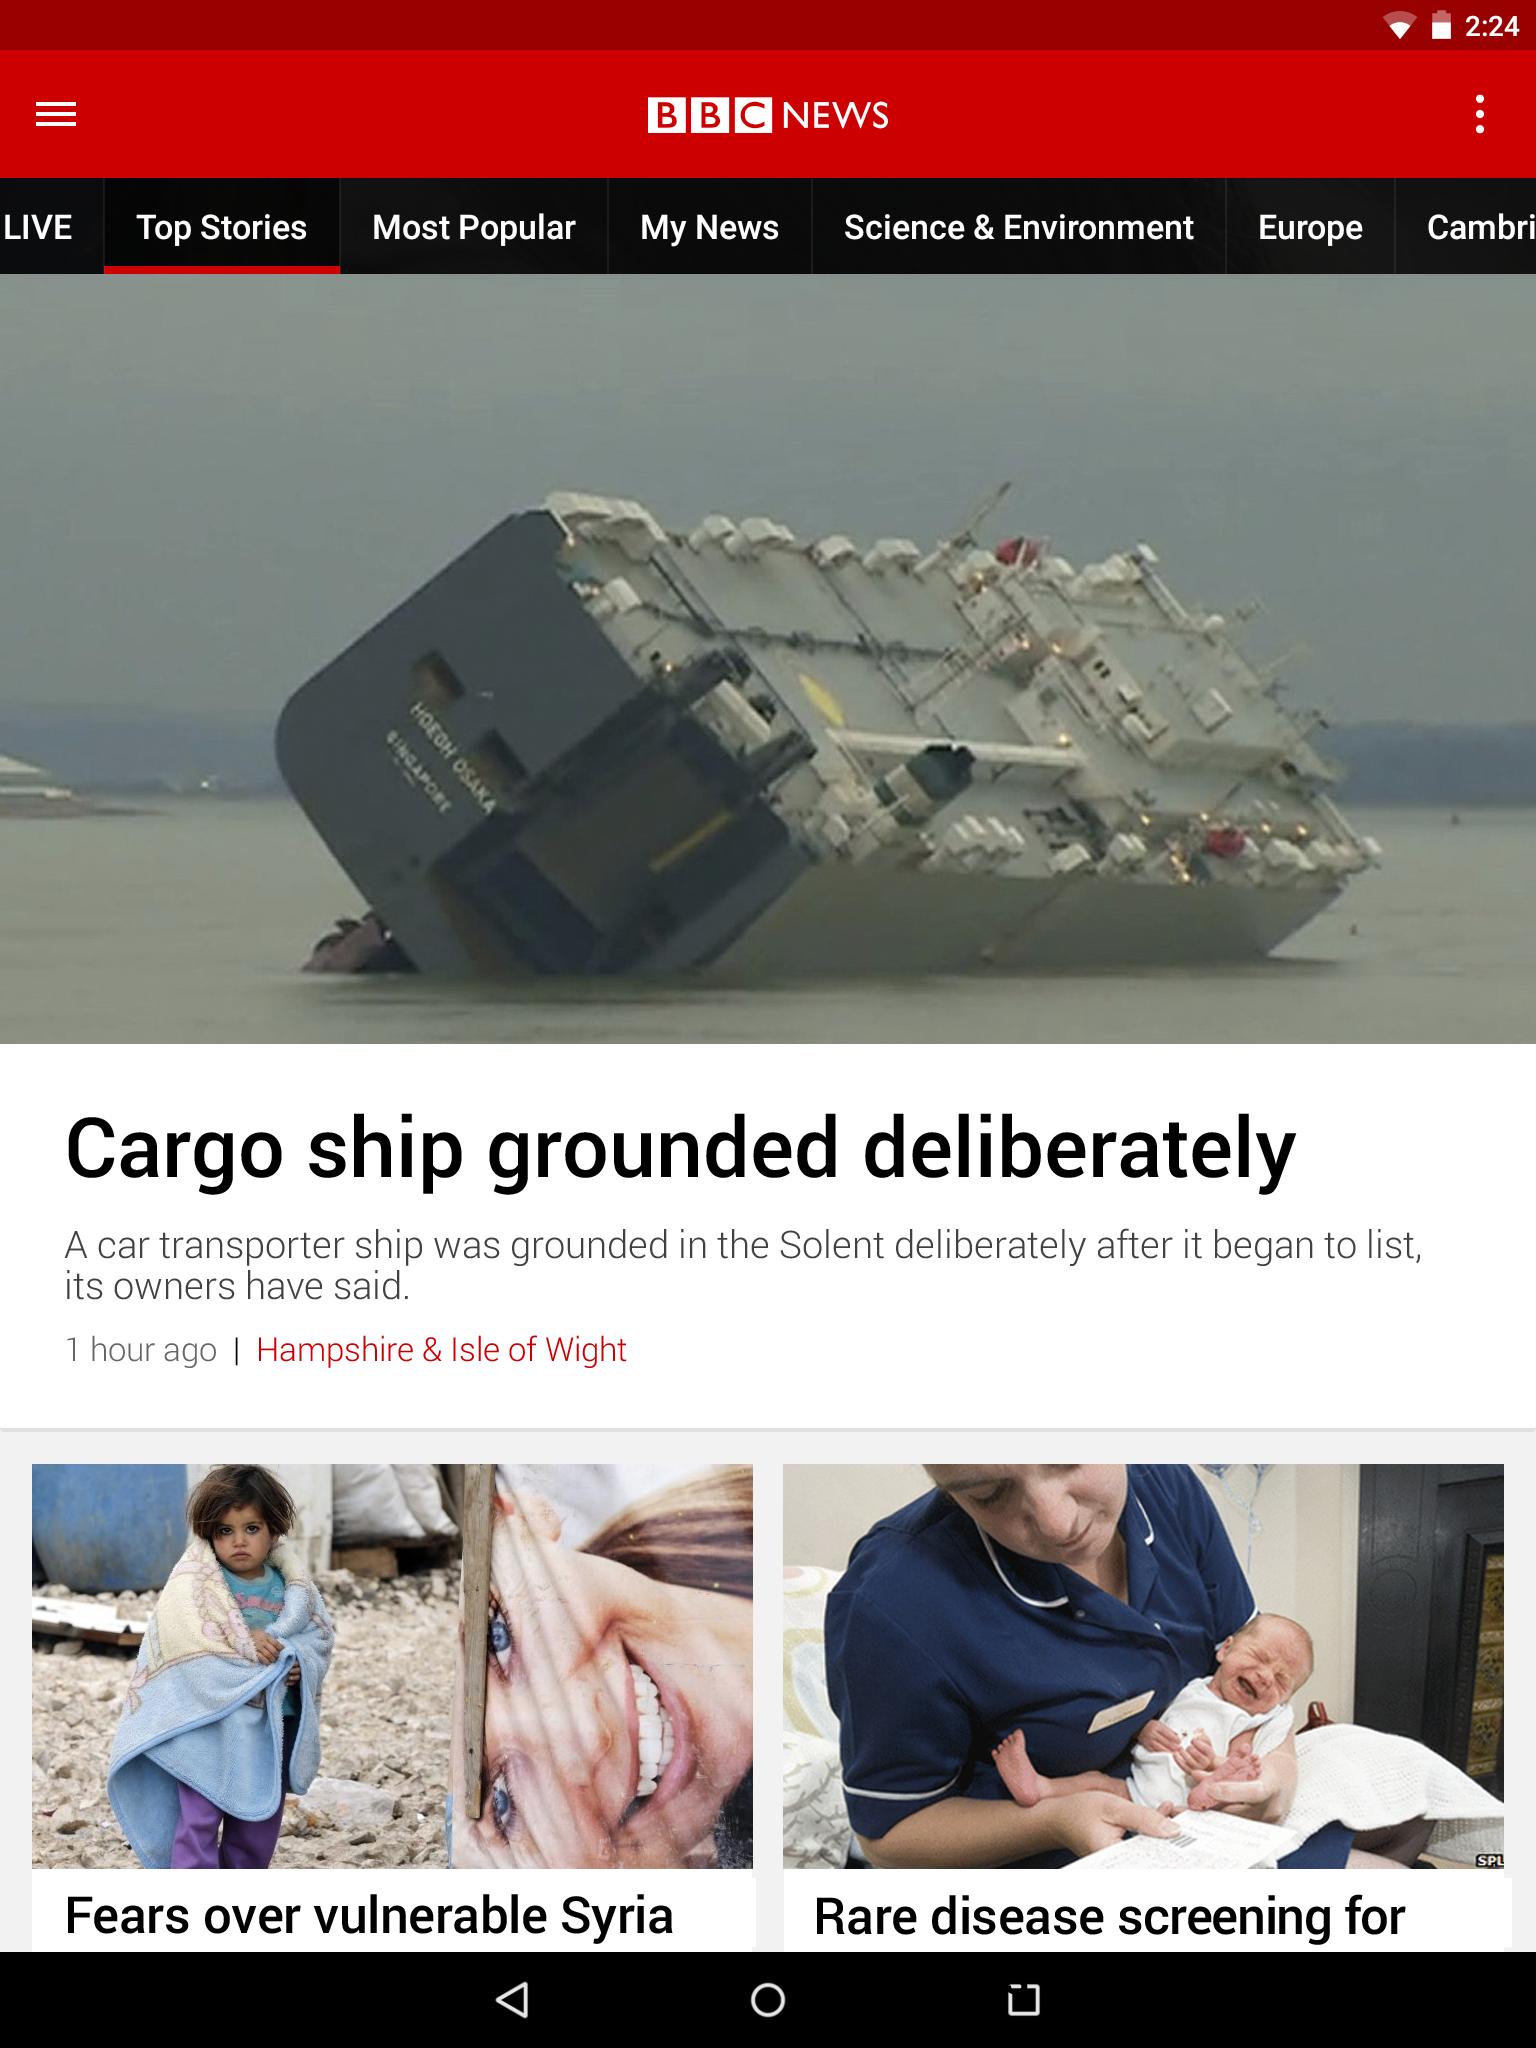 BBC News screenshot #7